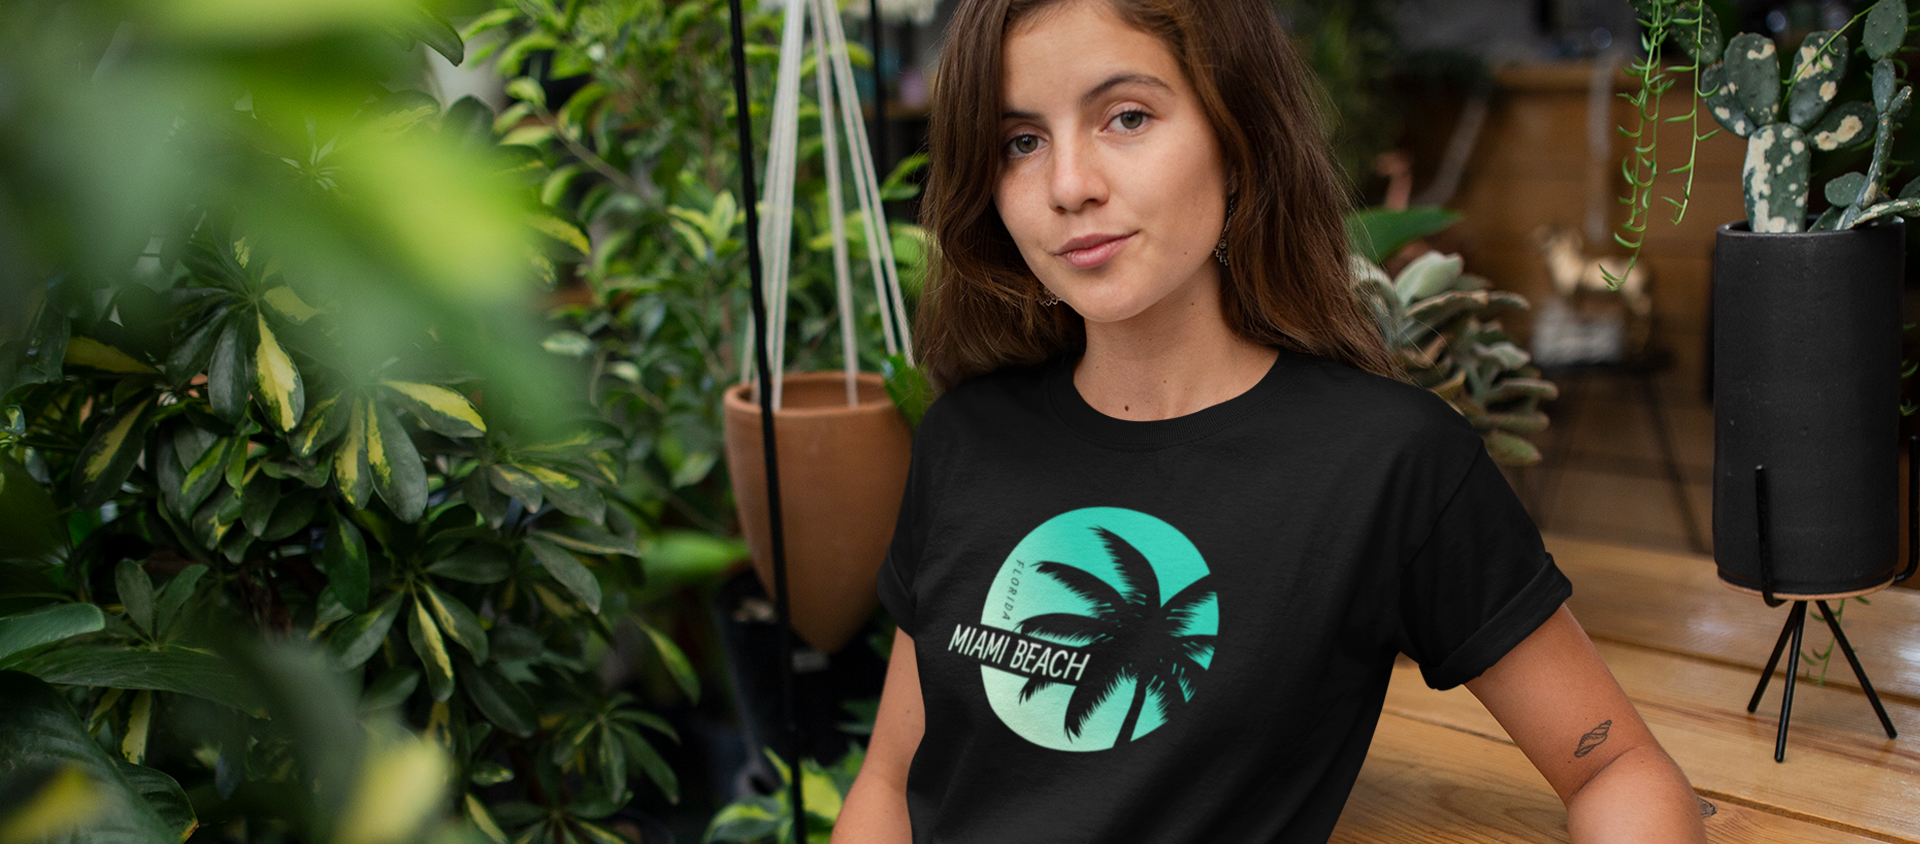 T-Shirt Business Sales nach Woche 3